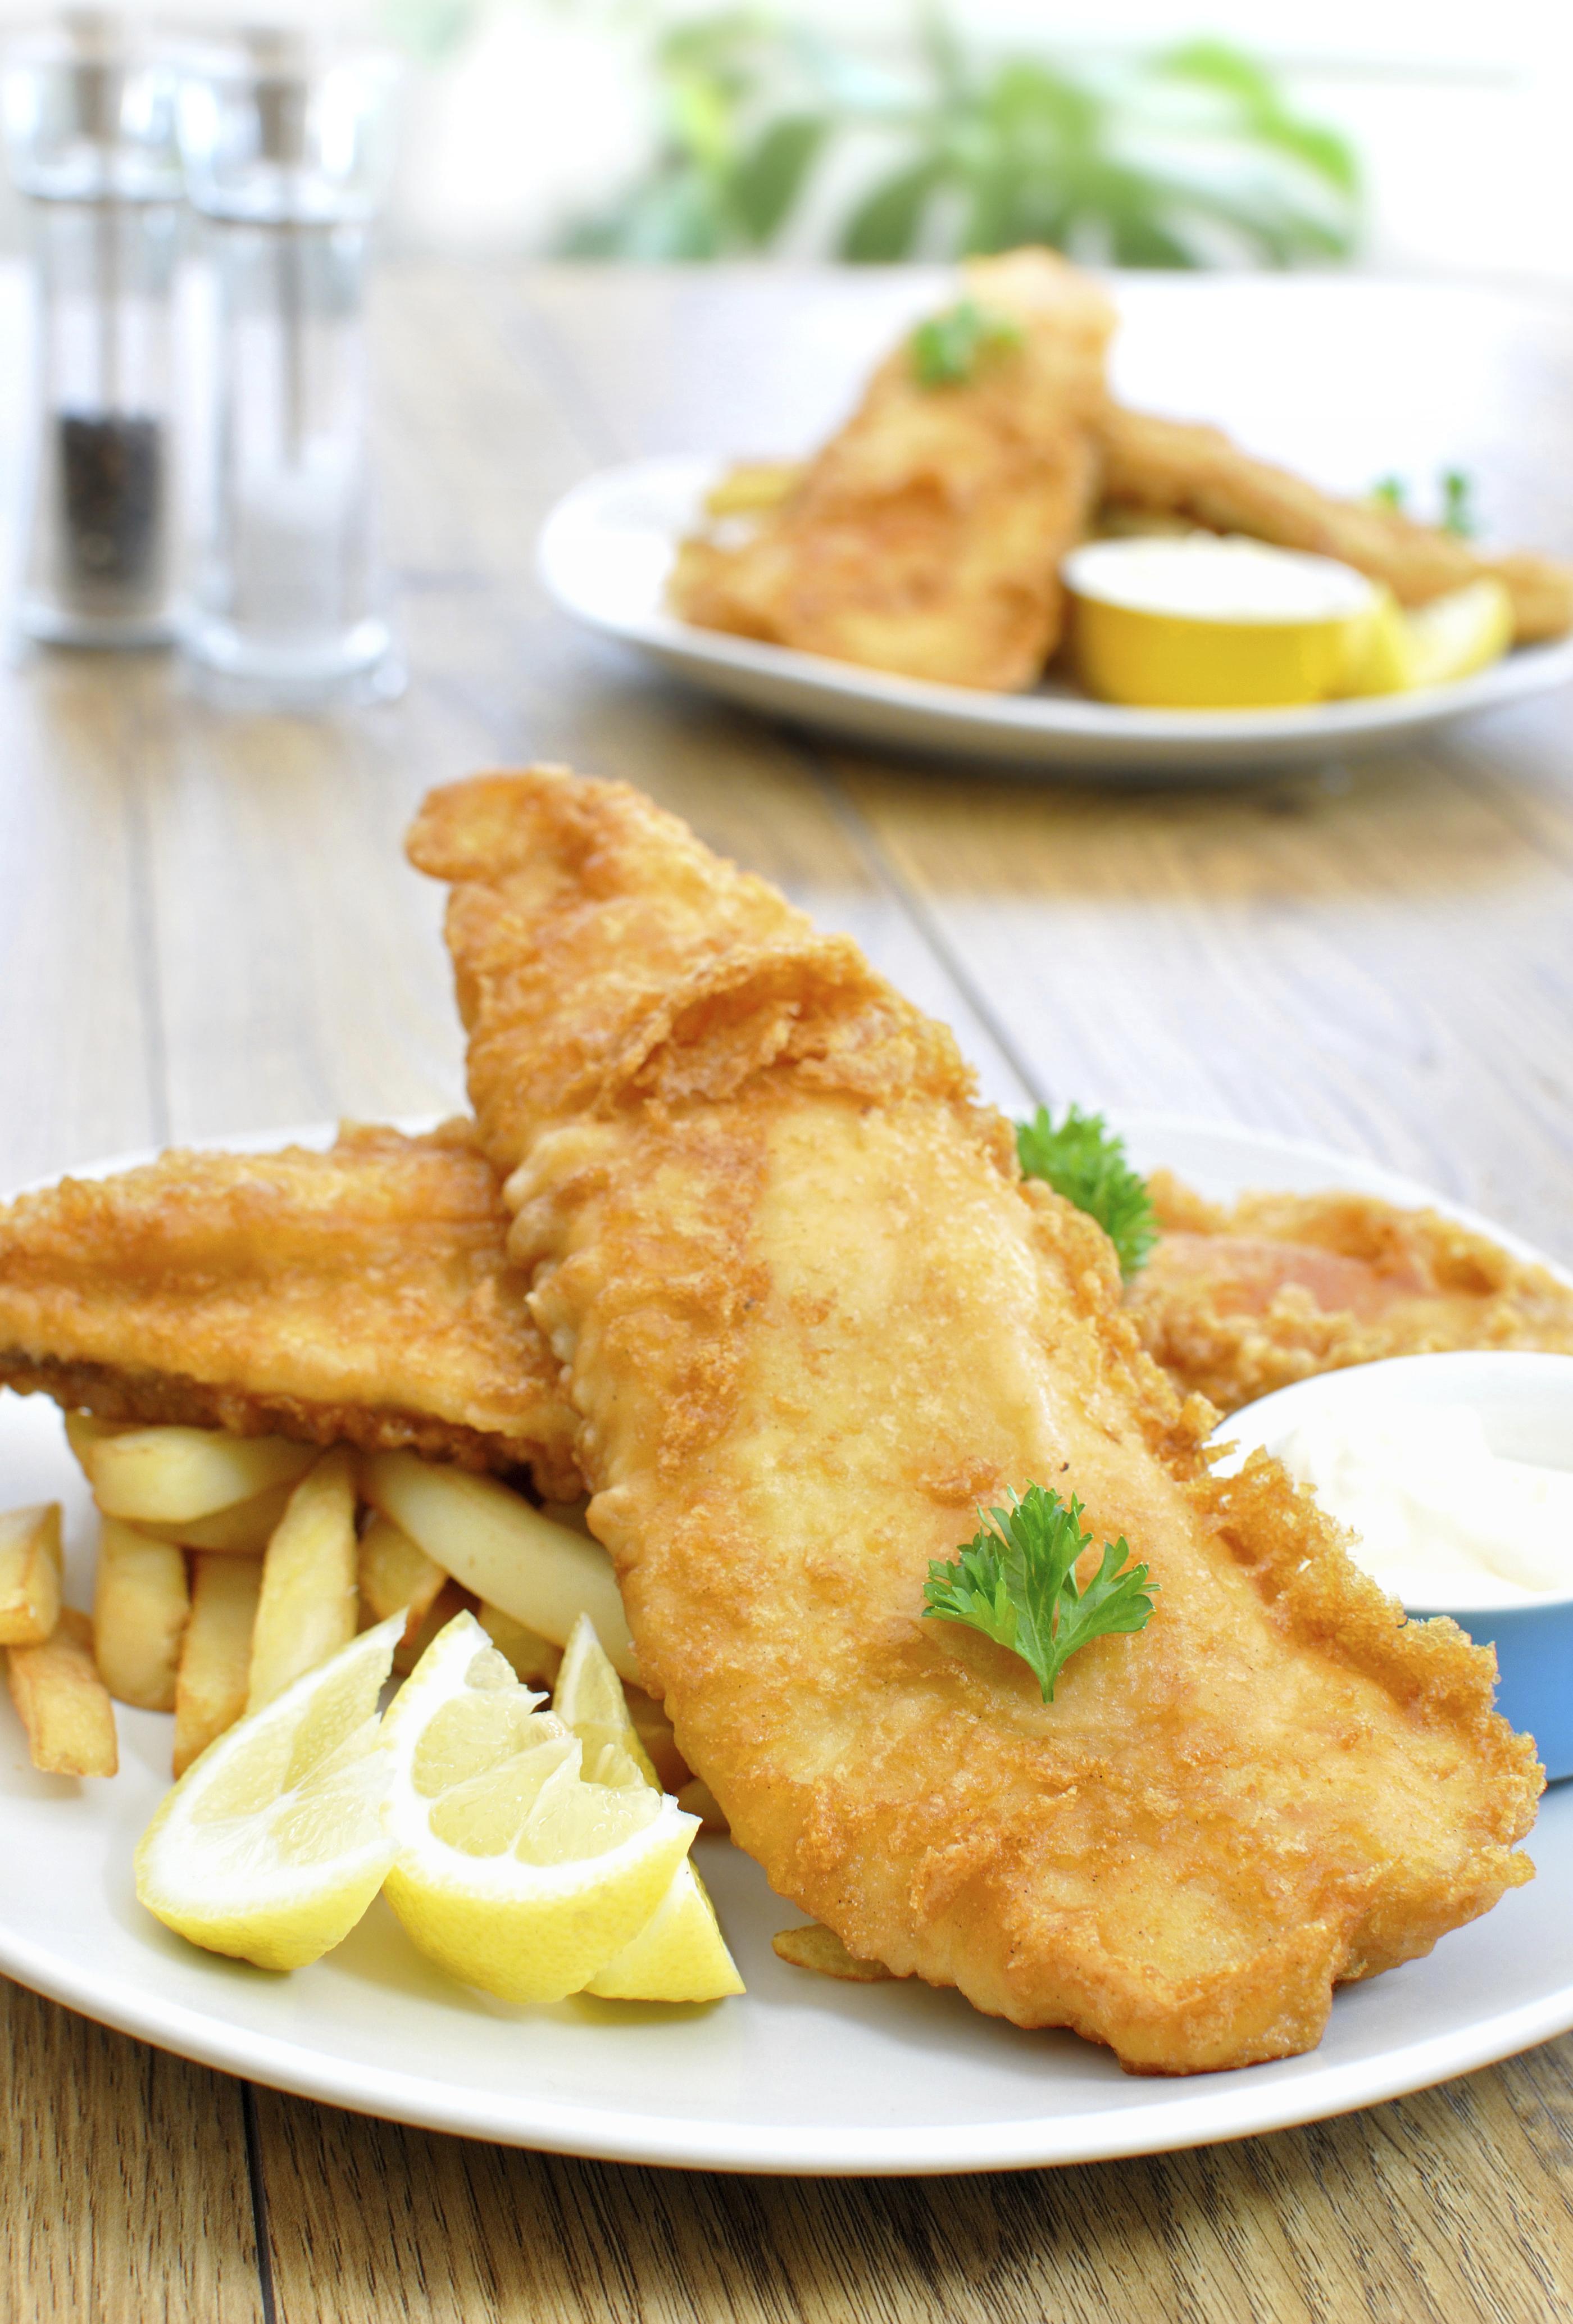 Traditional English fish and chips with lemon garnish and tartar sauce